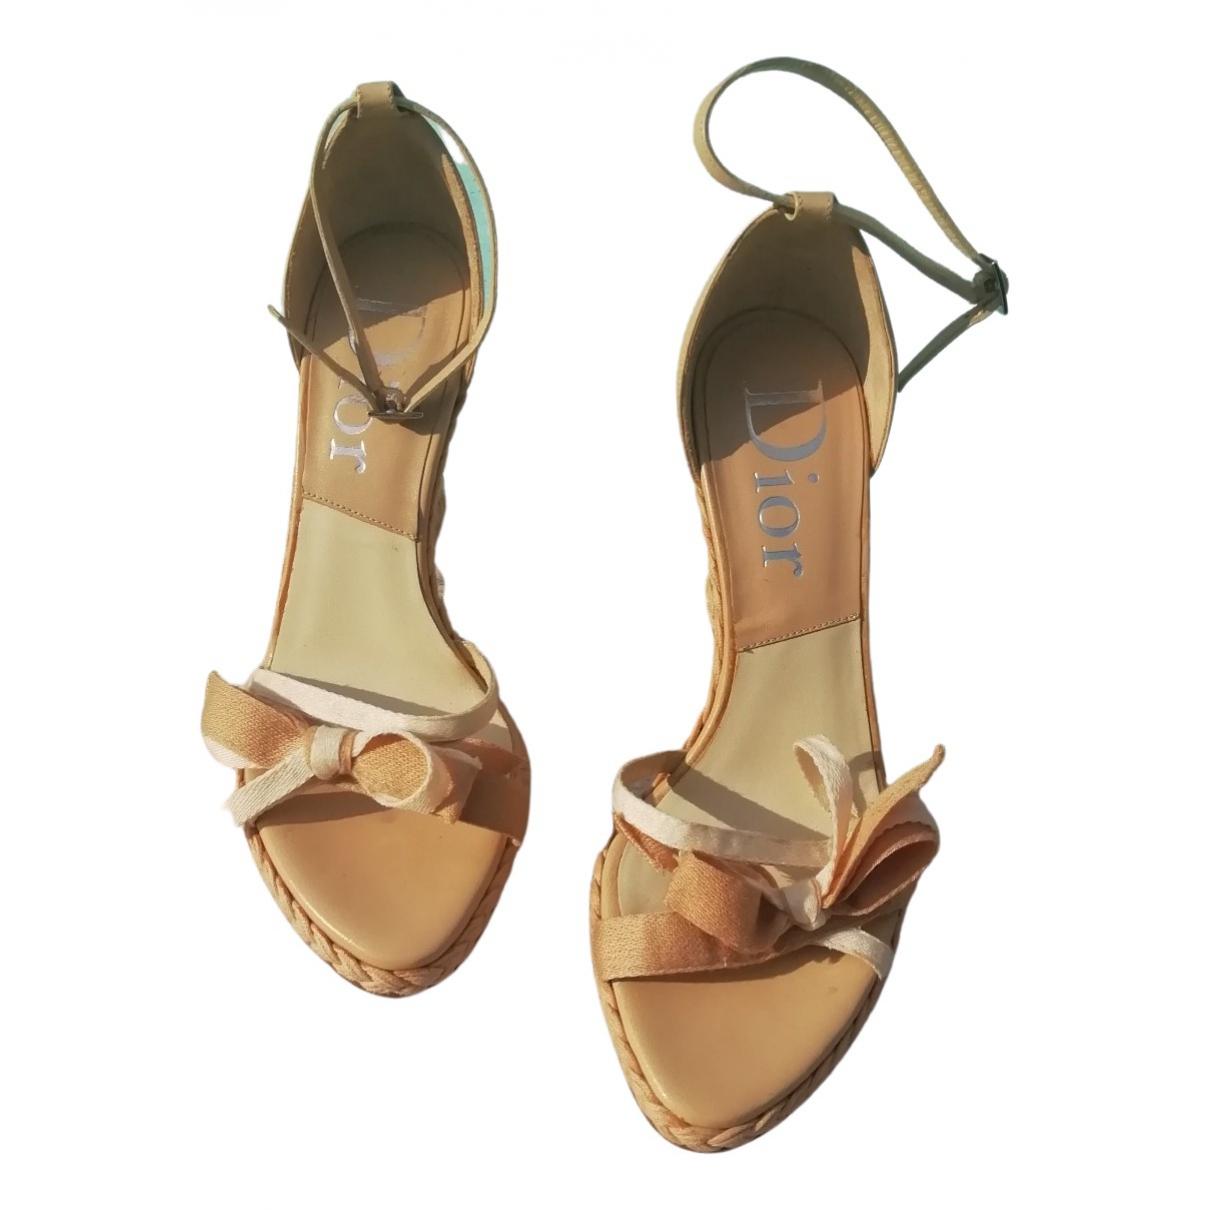 Dior \N Beige Leather Sandals for Women 36.5 EU